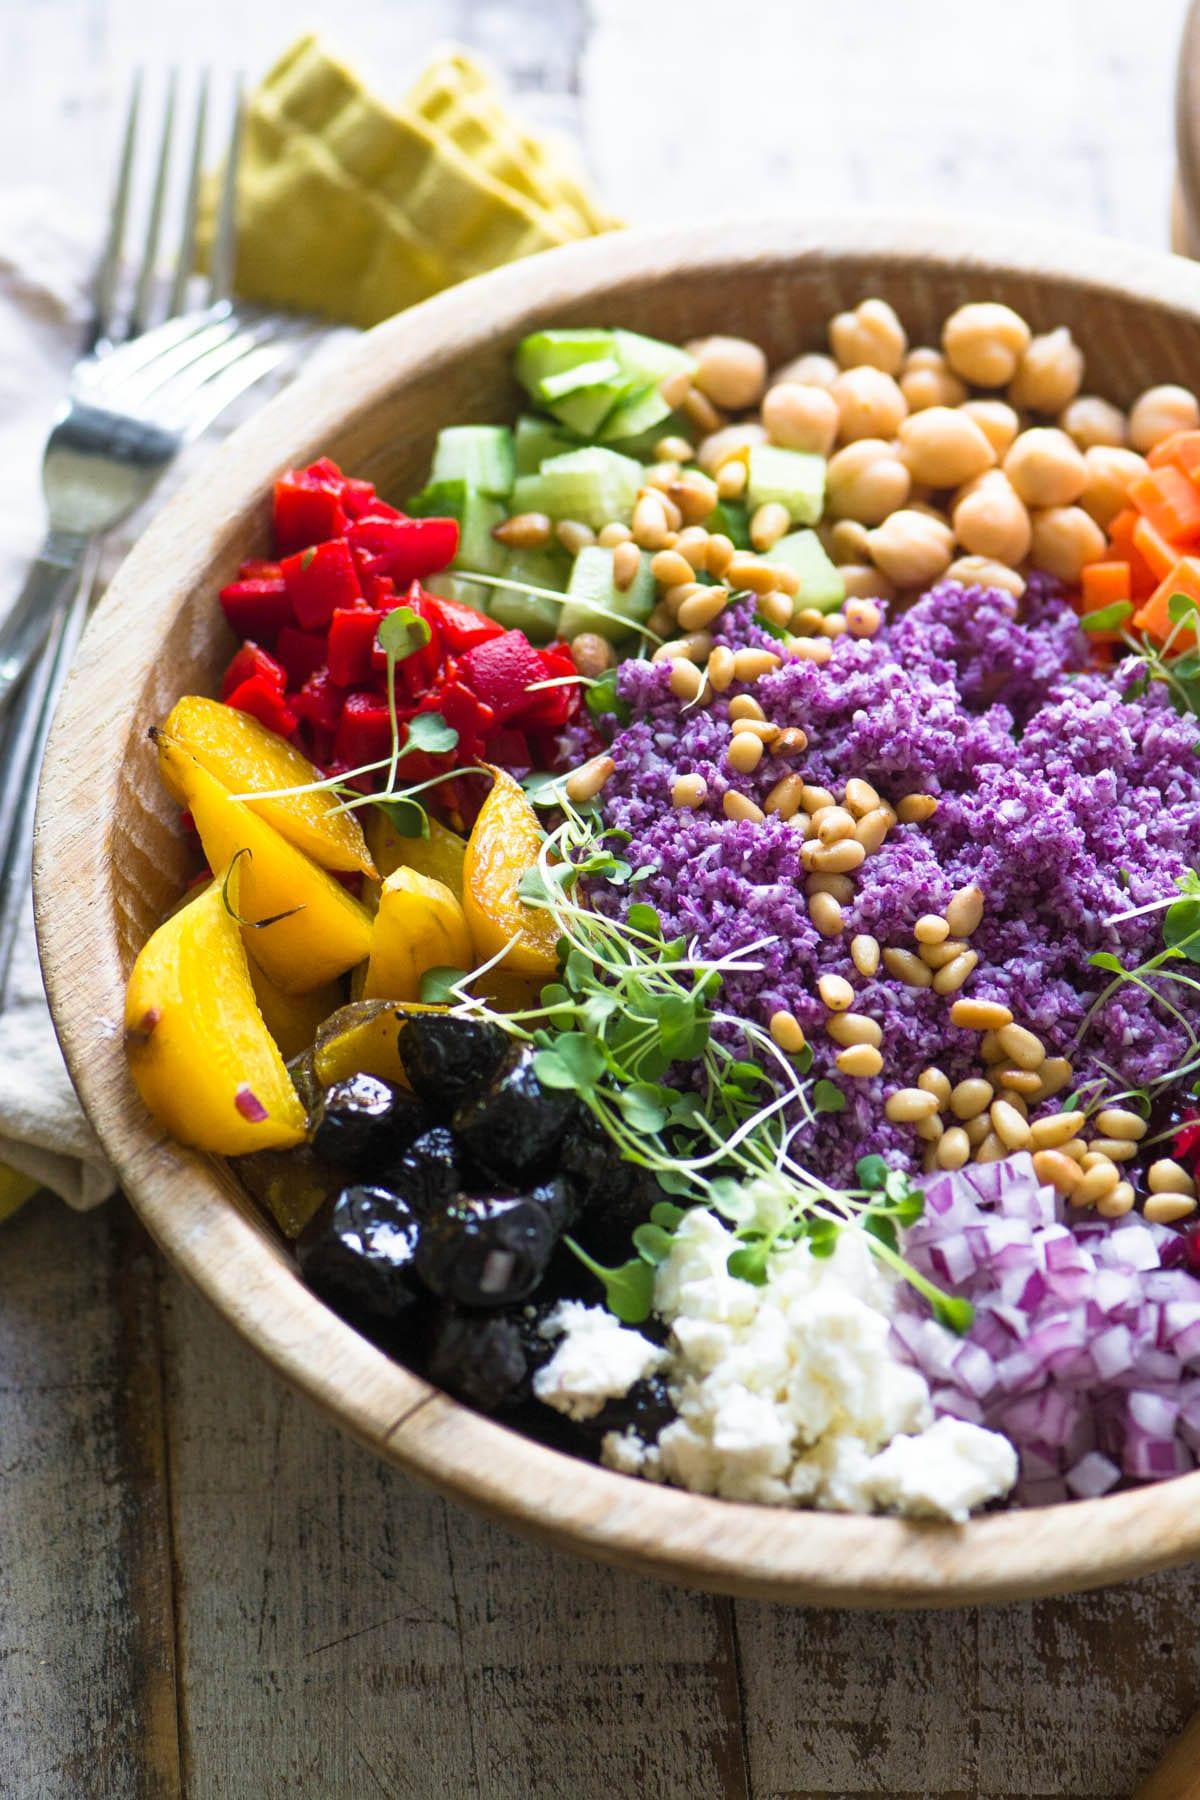 purple cauliflower rice salad in a wooden bowl